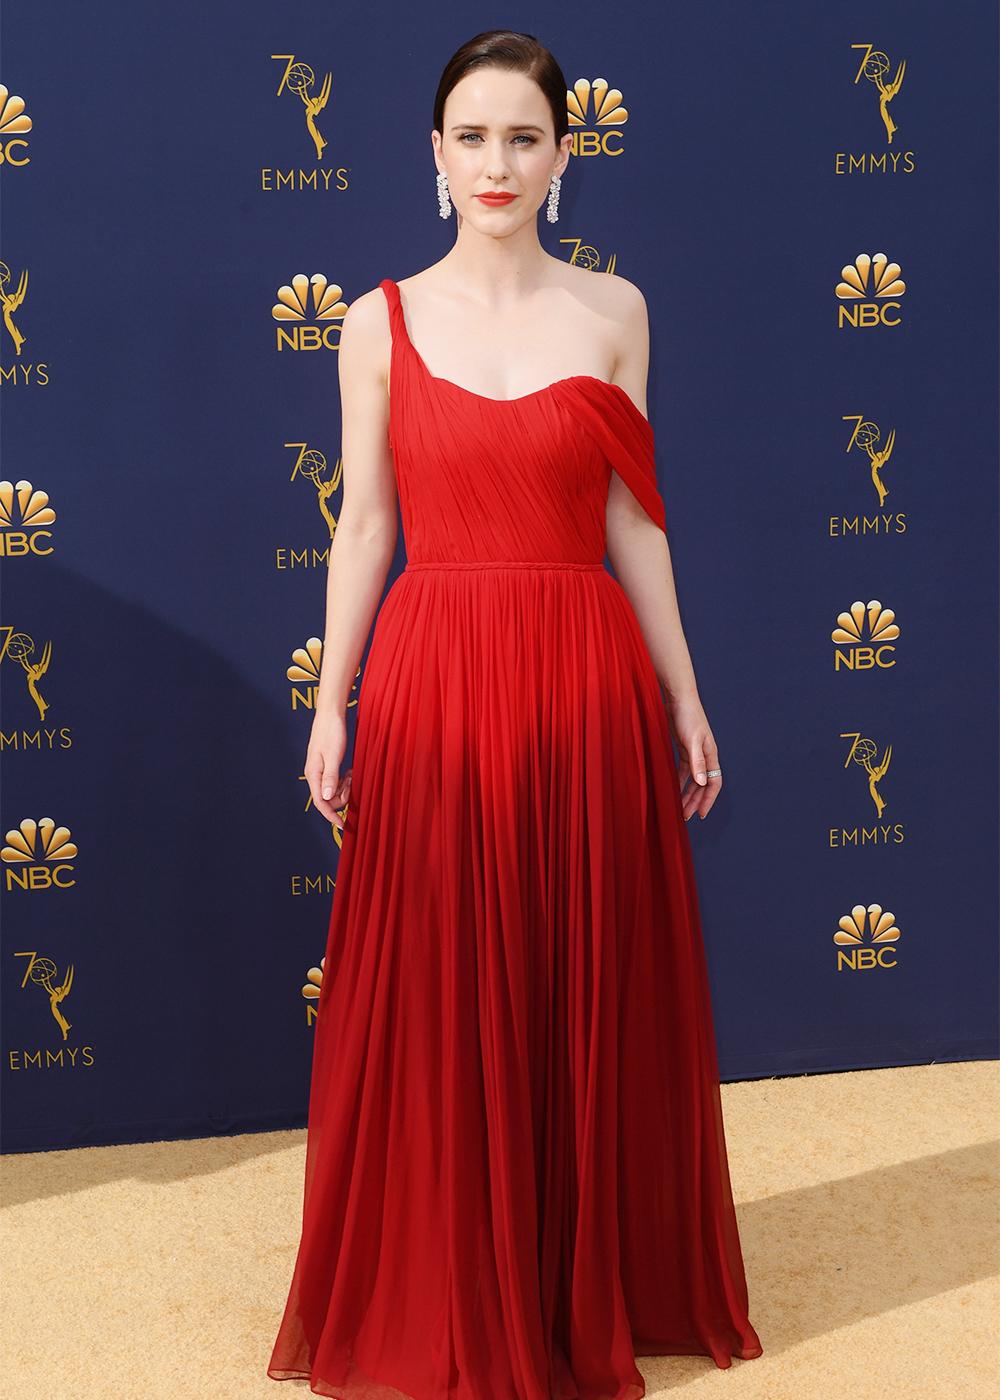 2018 Emmys Best Dressed I Rachel Brosnahan in Oscar de la Renta #Emmys #BestDressed #RachelBrosnahan #OscardelaRenta